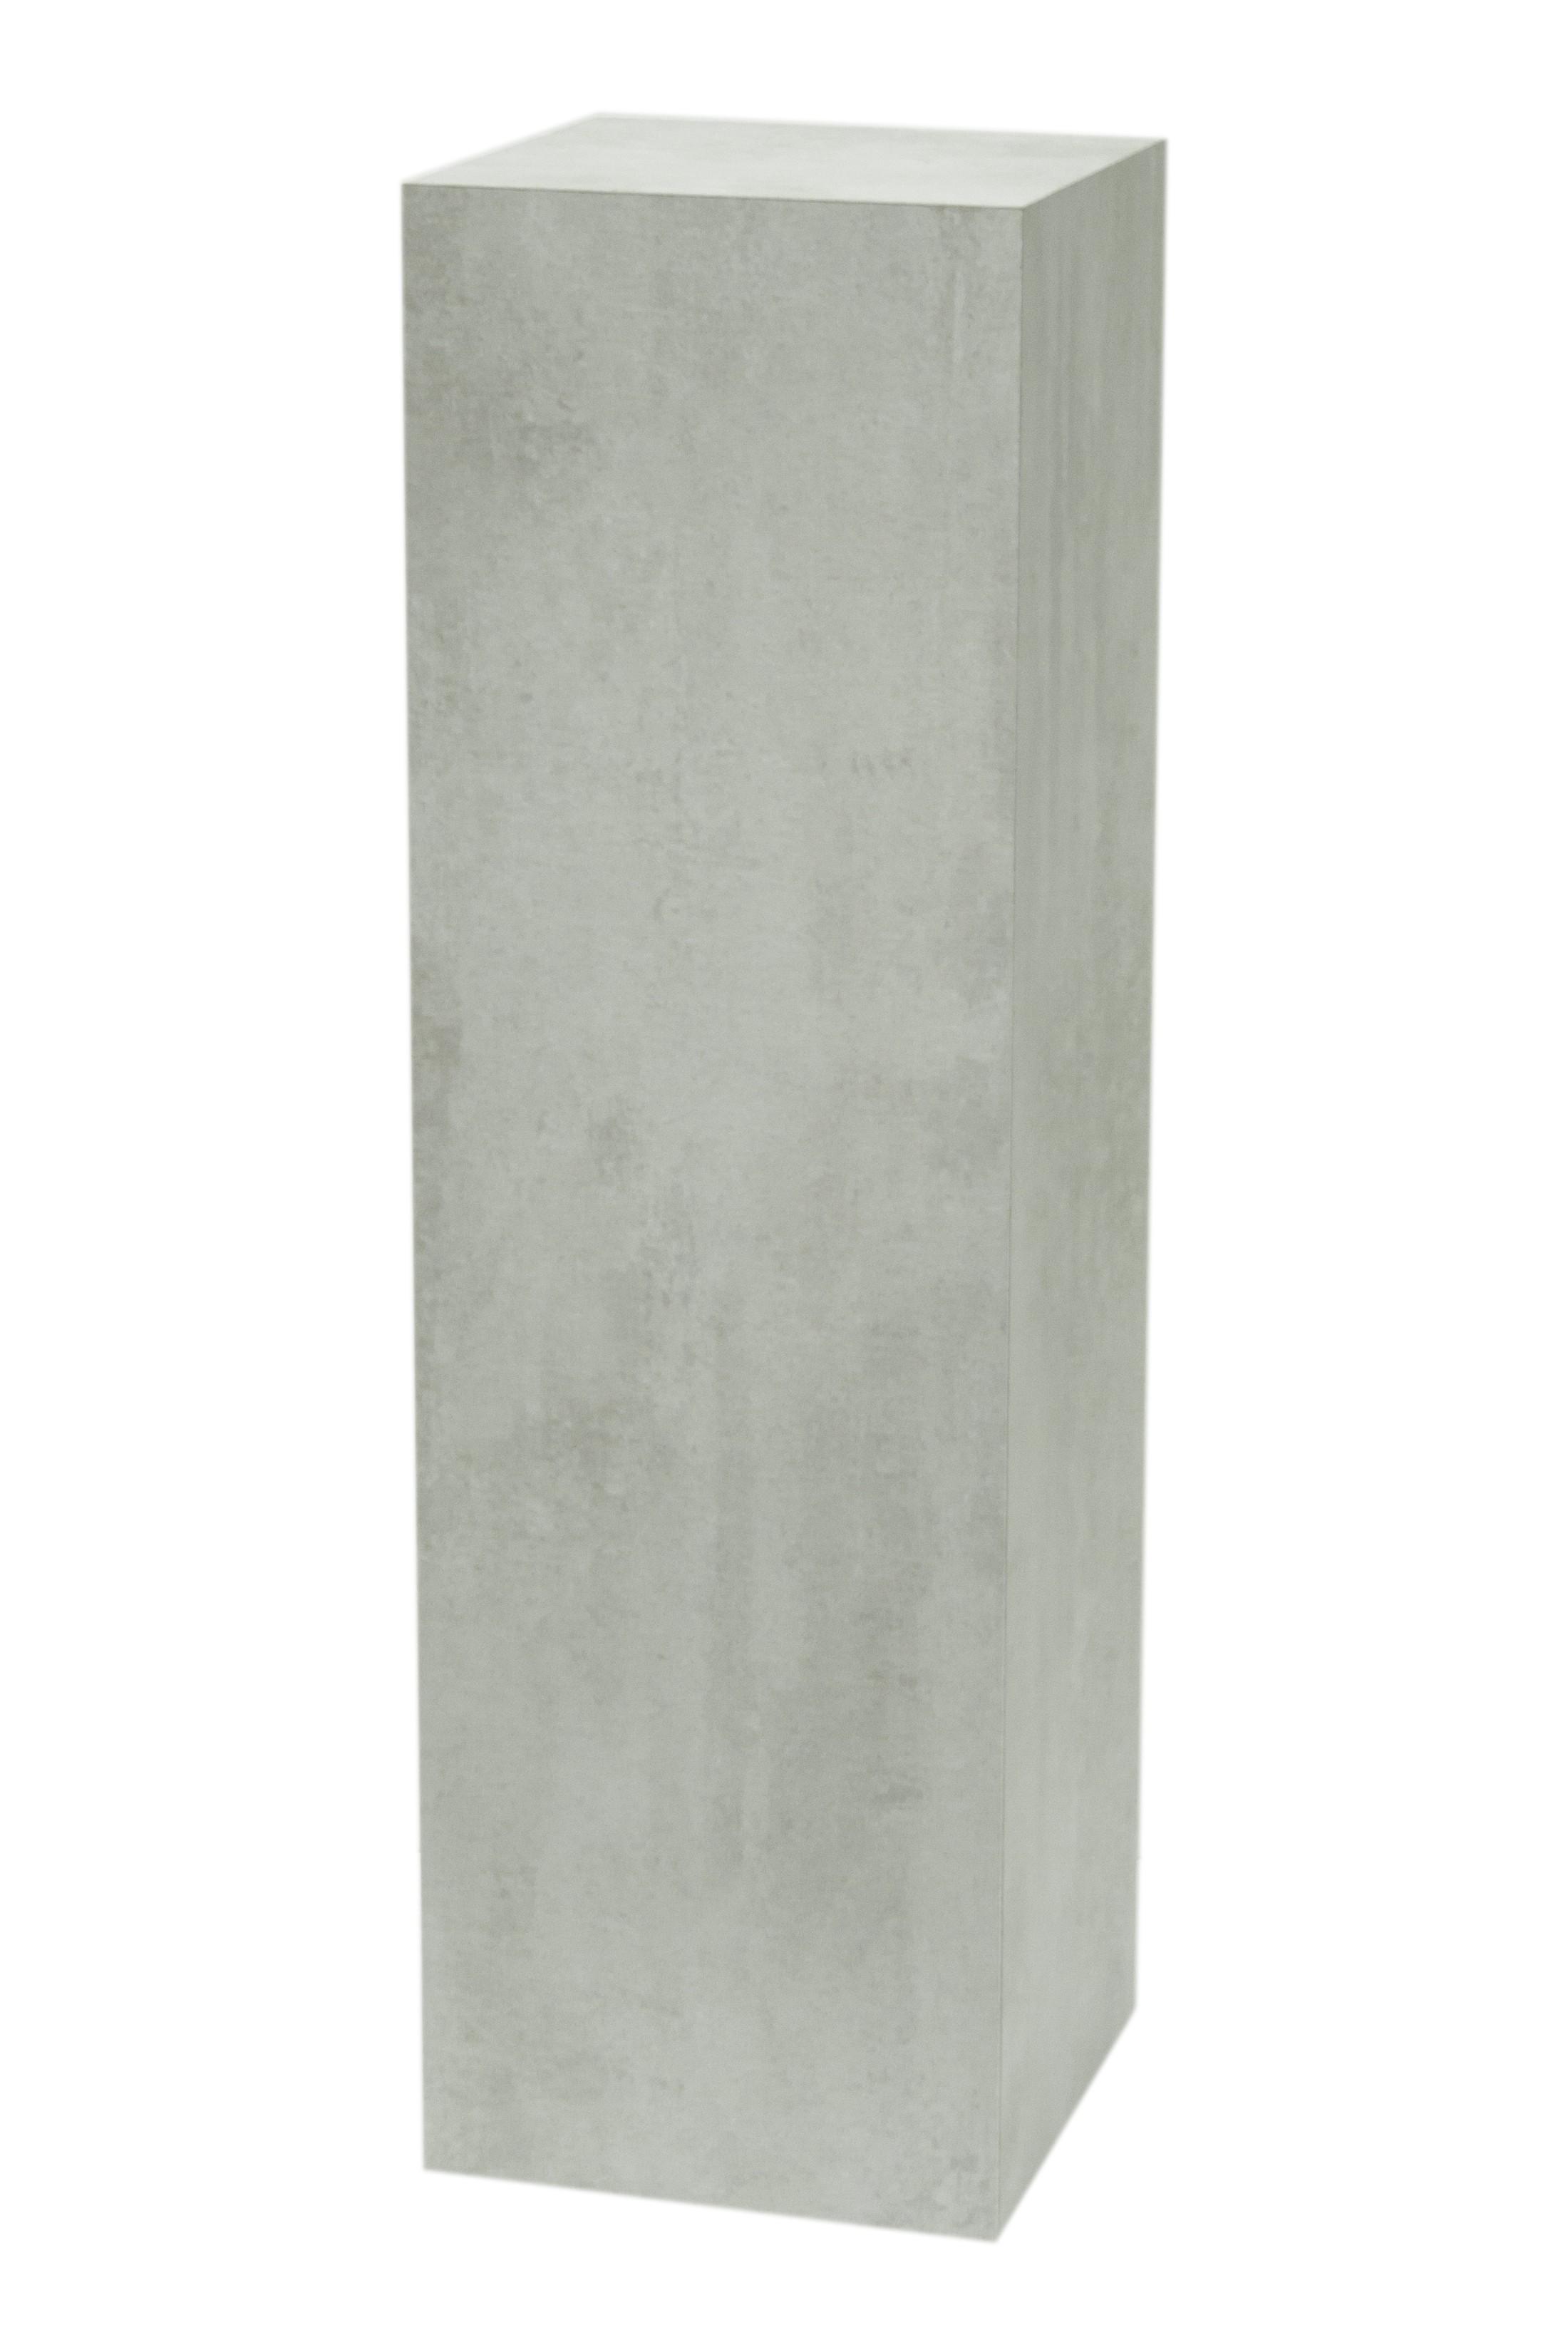 Solits podie beton look